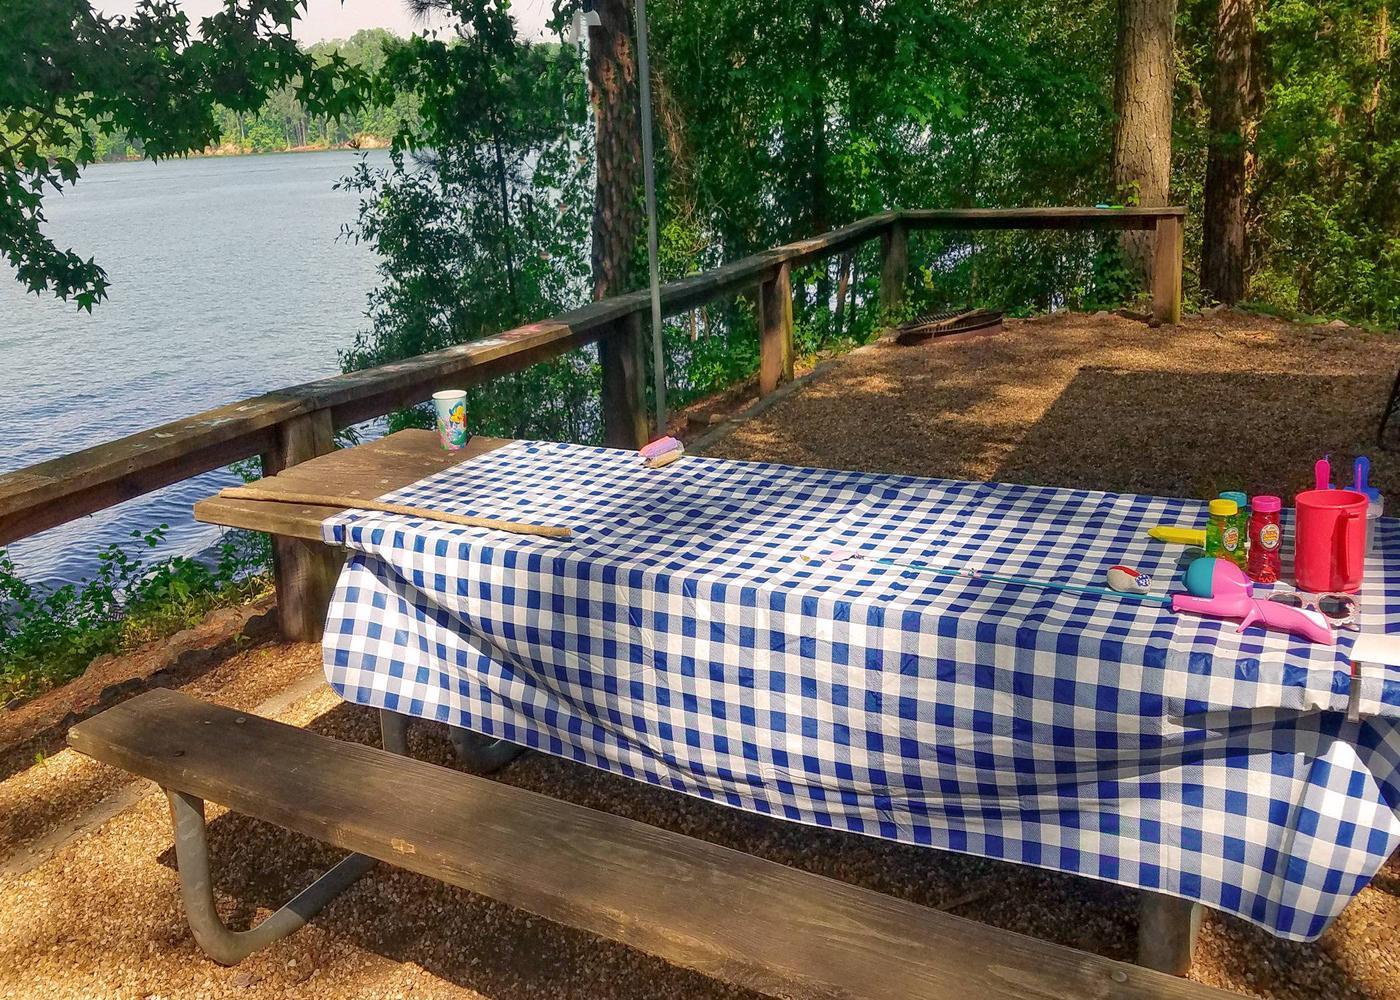 Campsite view.Victoria Campground, campsite 19.